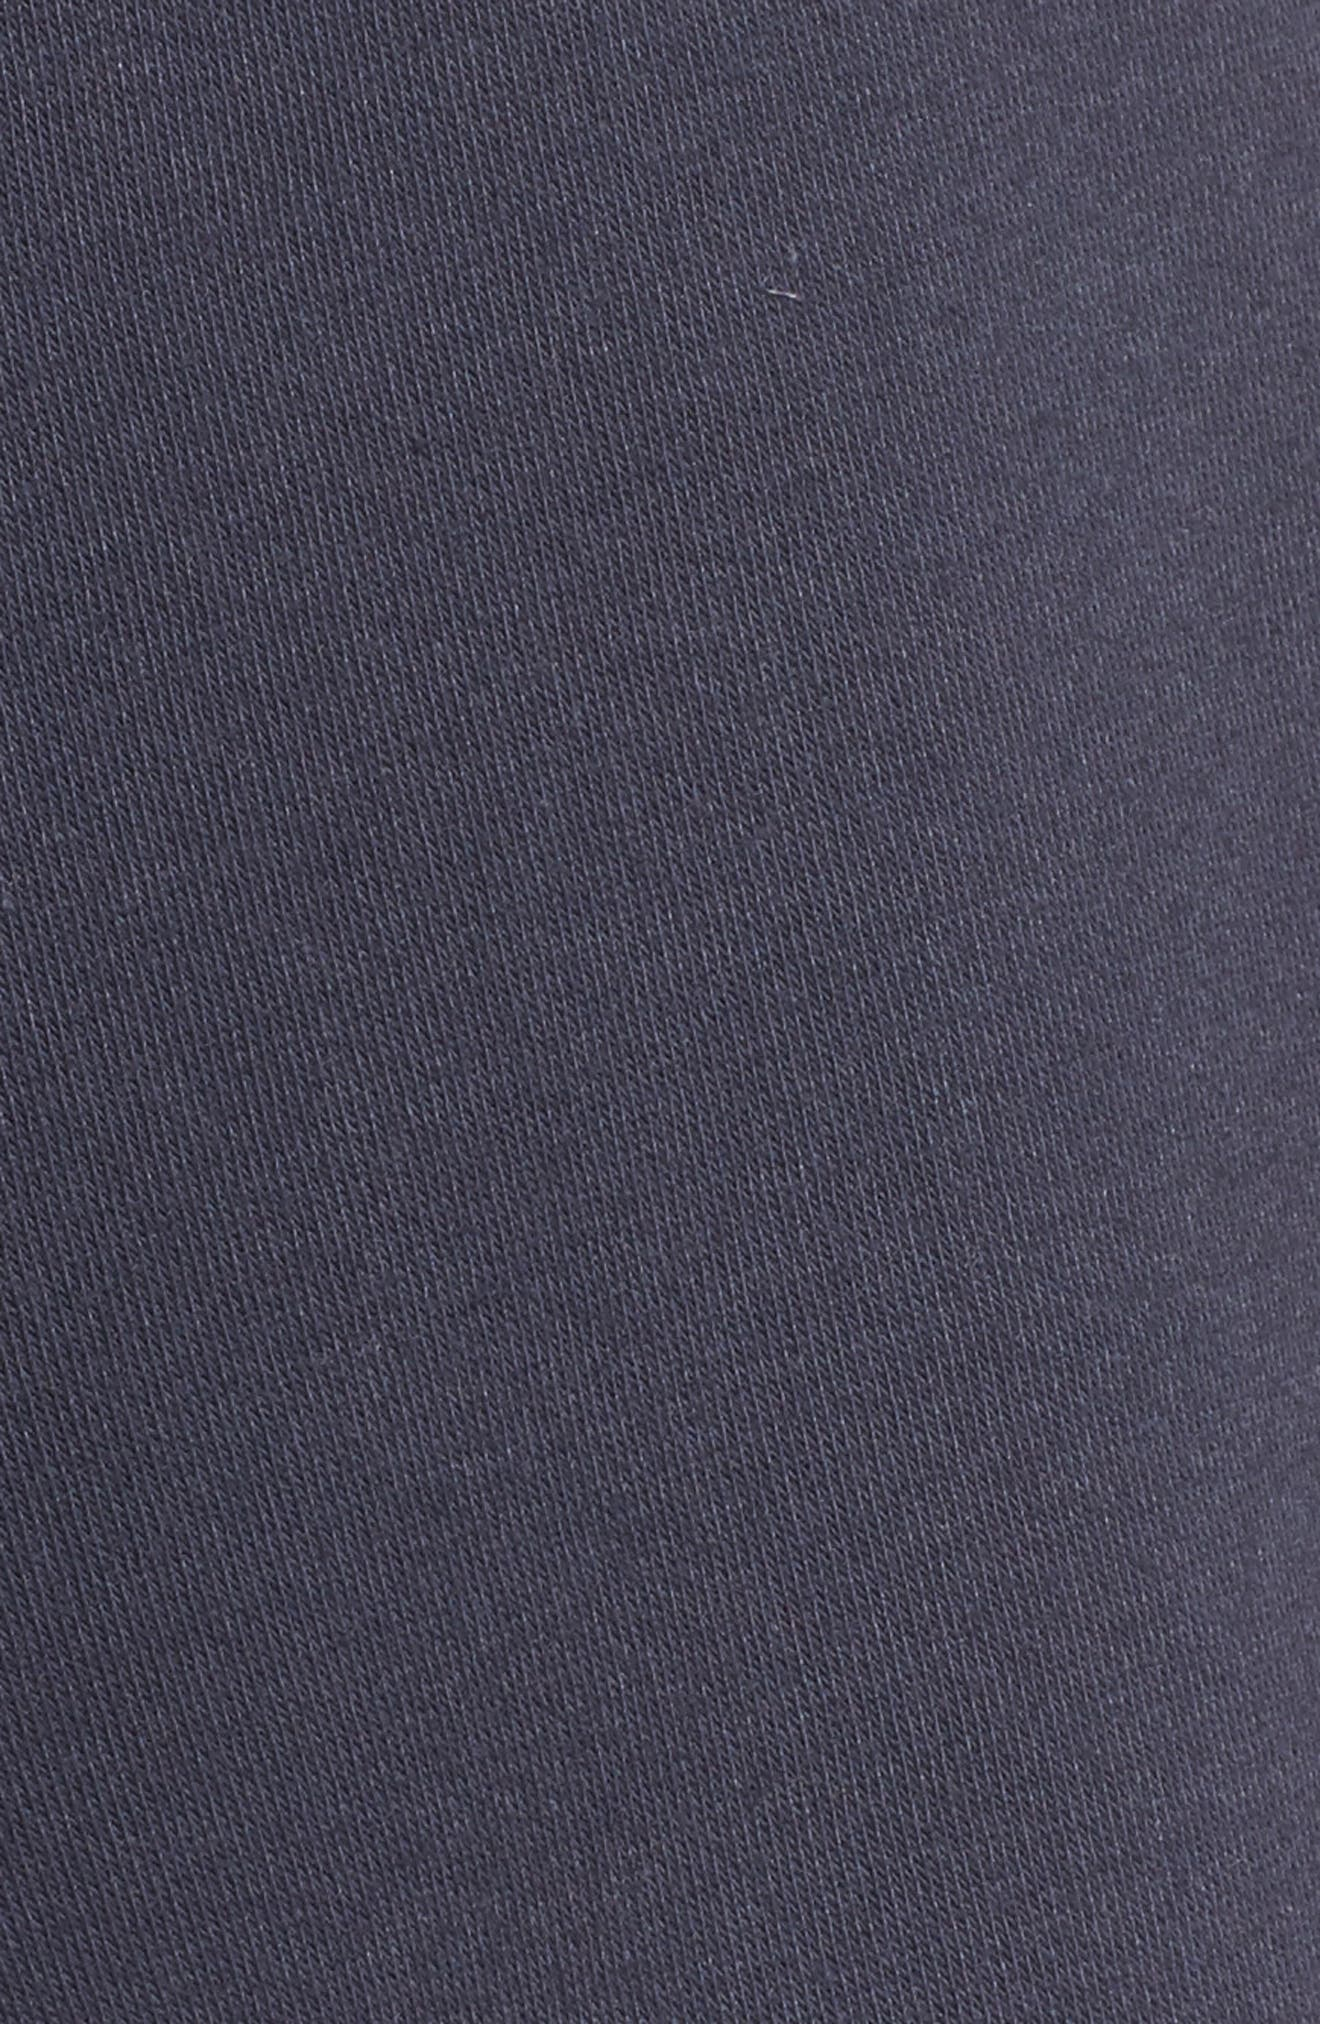 Take It Easy Lounge Shorts,                             Alternate thumbnail 7, color,                             Navy Blue